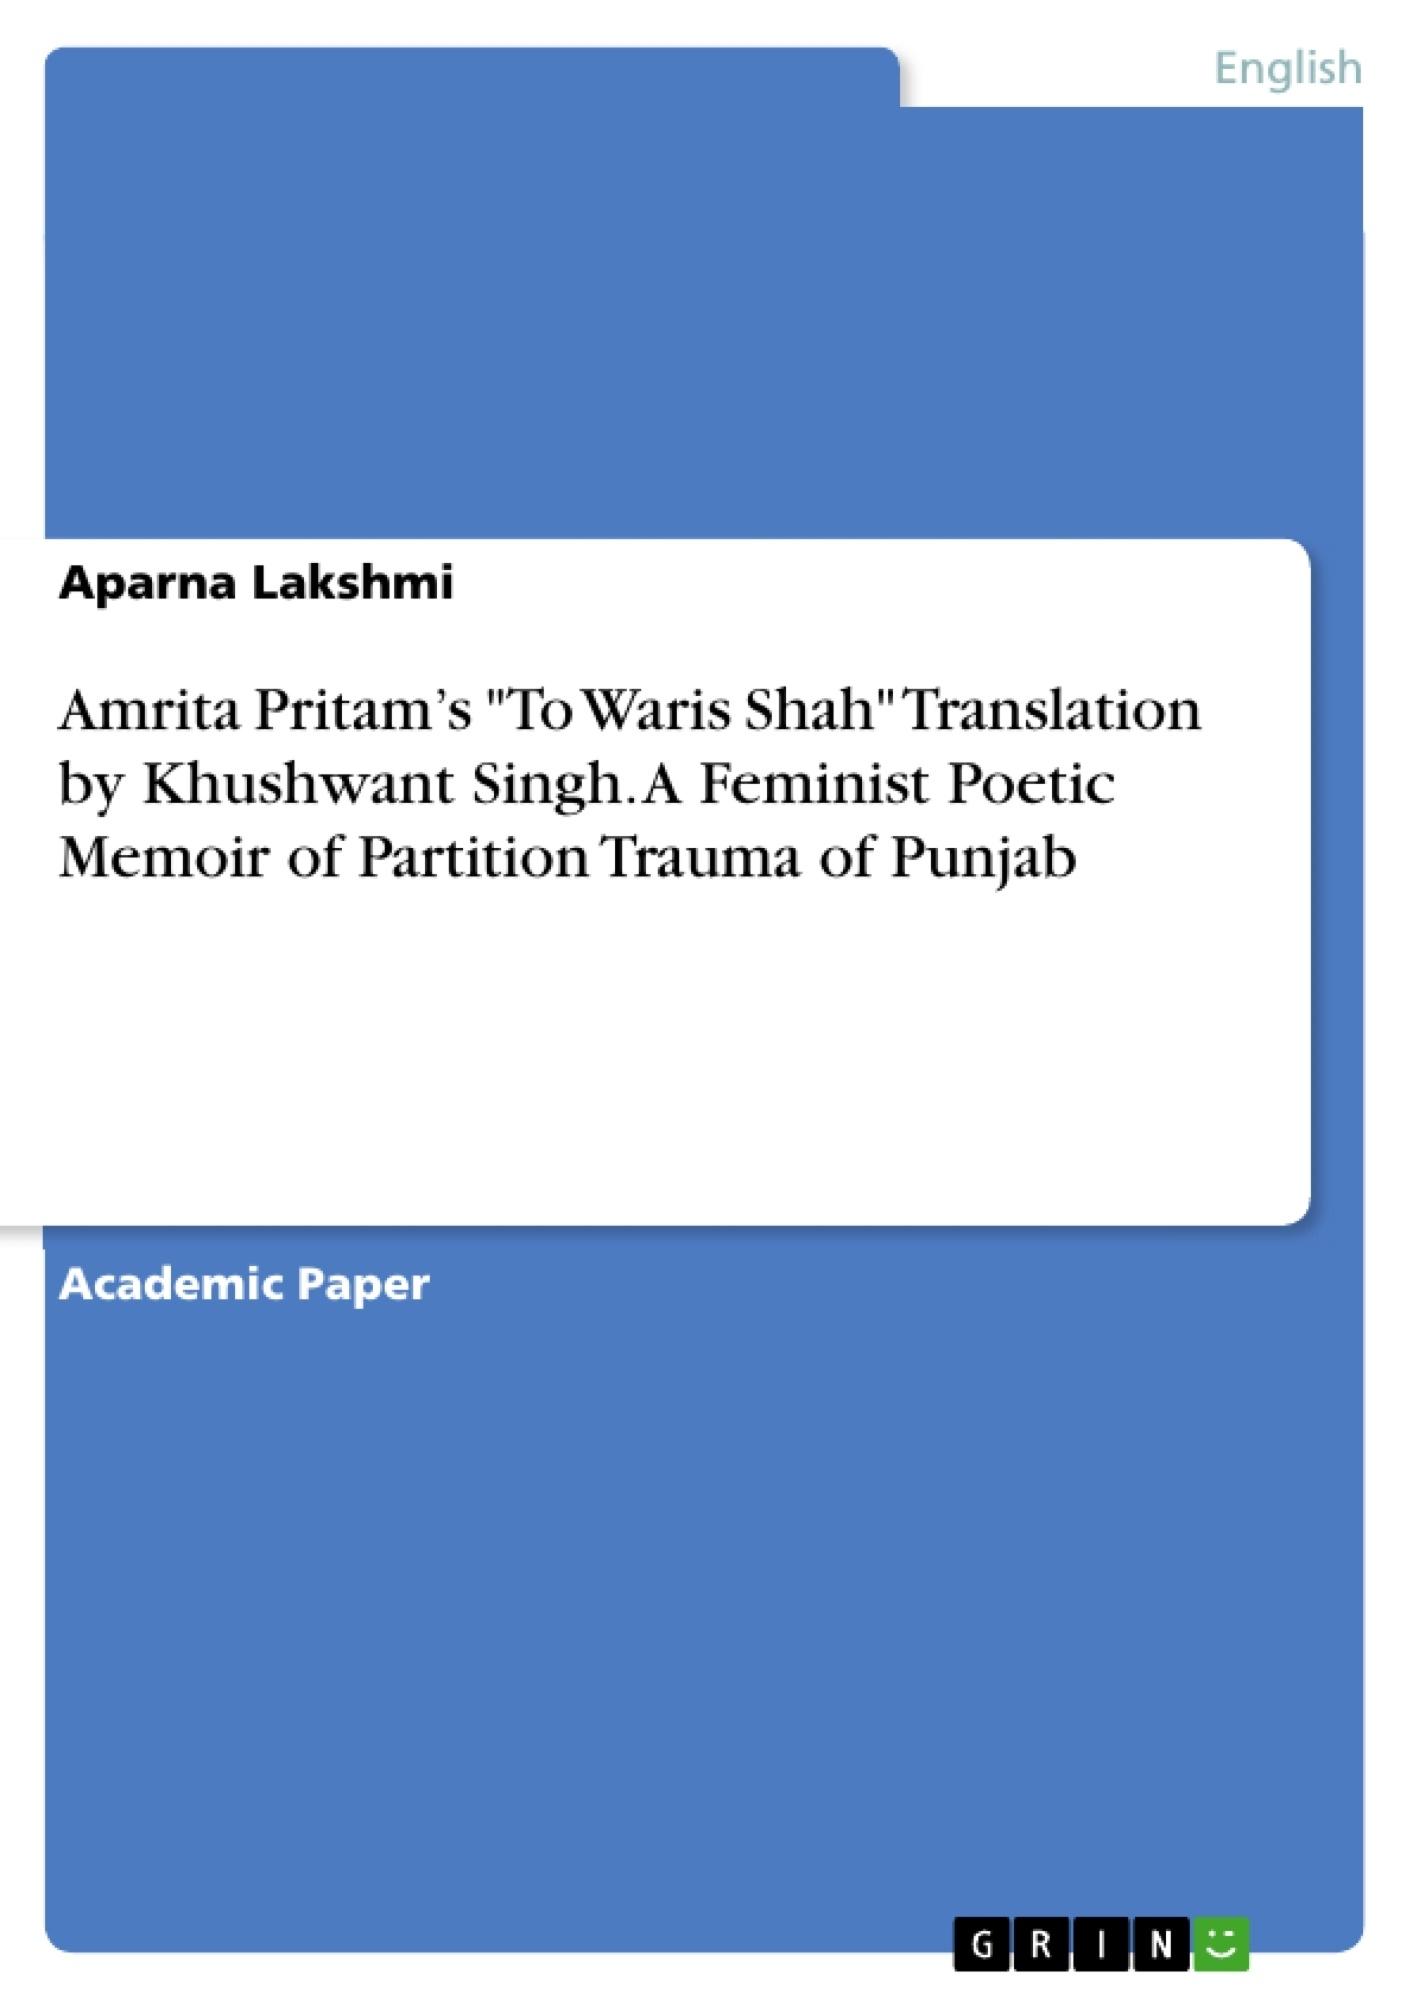 "Title: Amrita Pritam's ""To Waris Shah"" Translation by Khushwant Singh. A Feminist Poetic Memoir of Partition Trauma of Punjab"